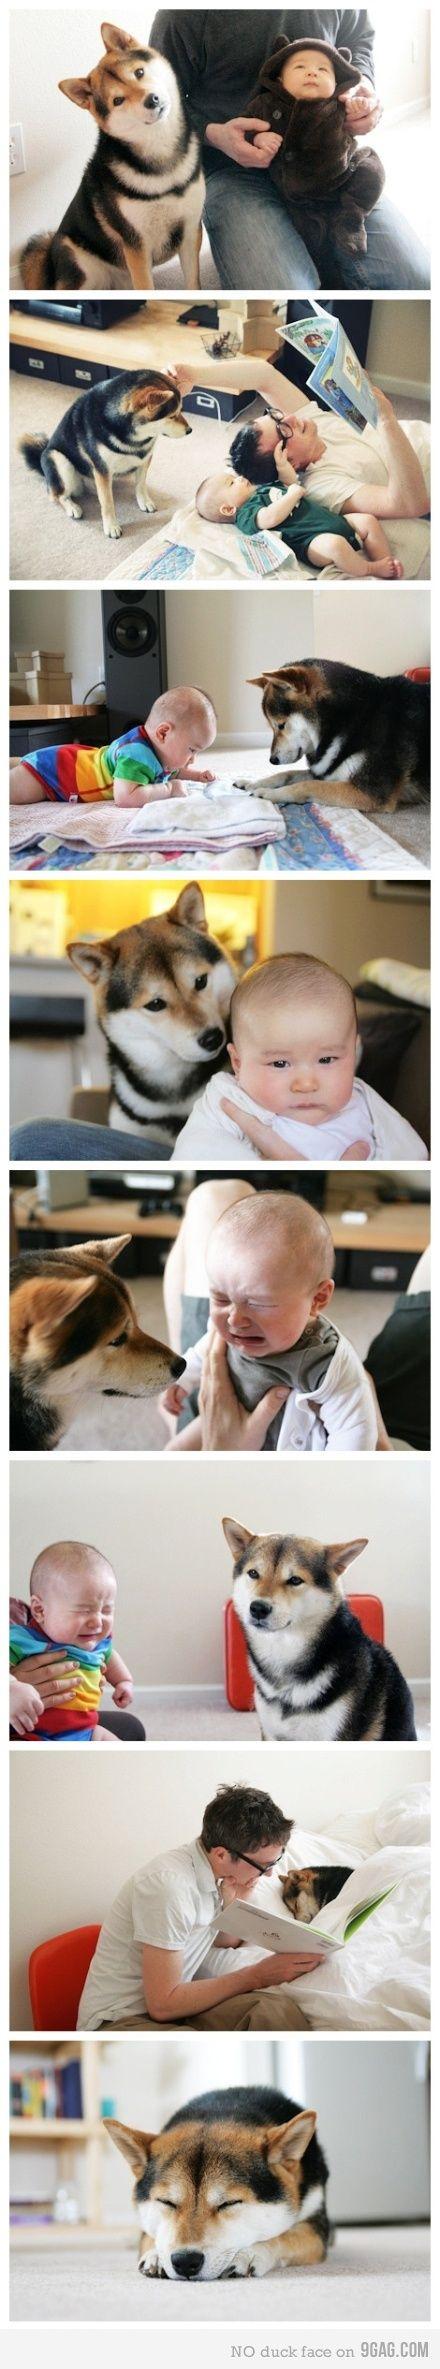 shiba inu. cuteness: Cute Baby, Shiba Inu, Baby 3, Puppys, Baby Dogs, I Love Dogs, Cute Dogs, Beautiful Dogs, Animal